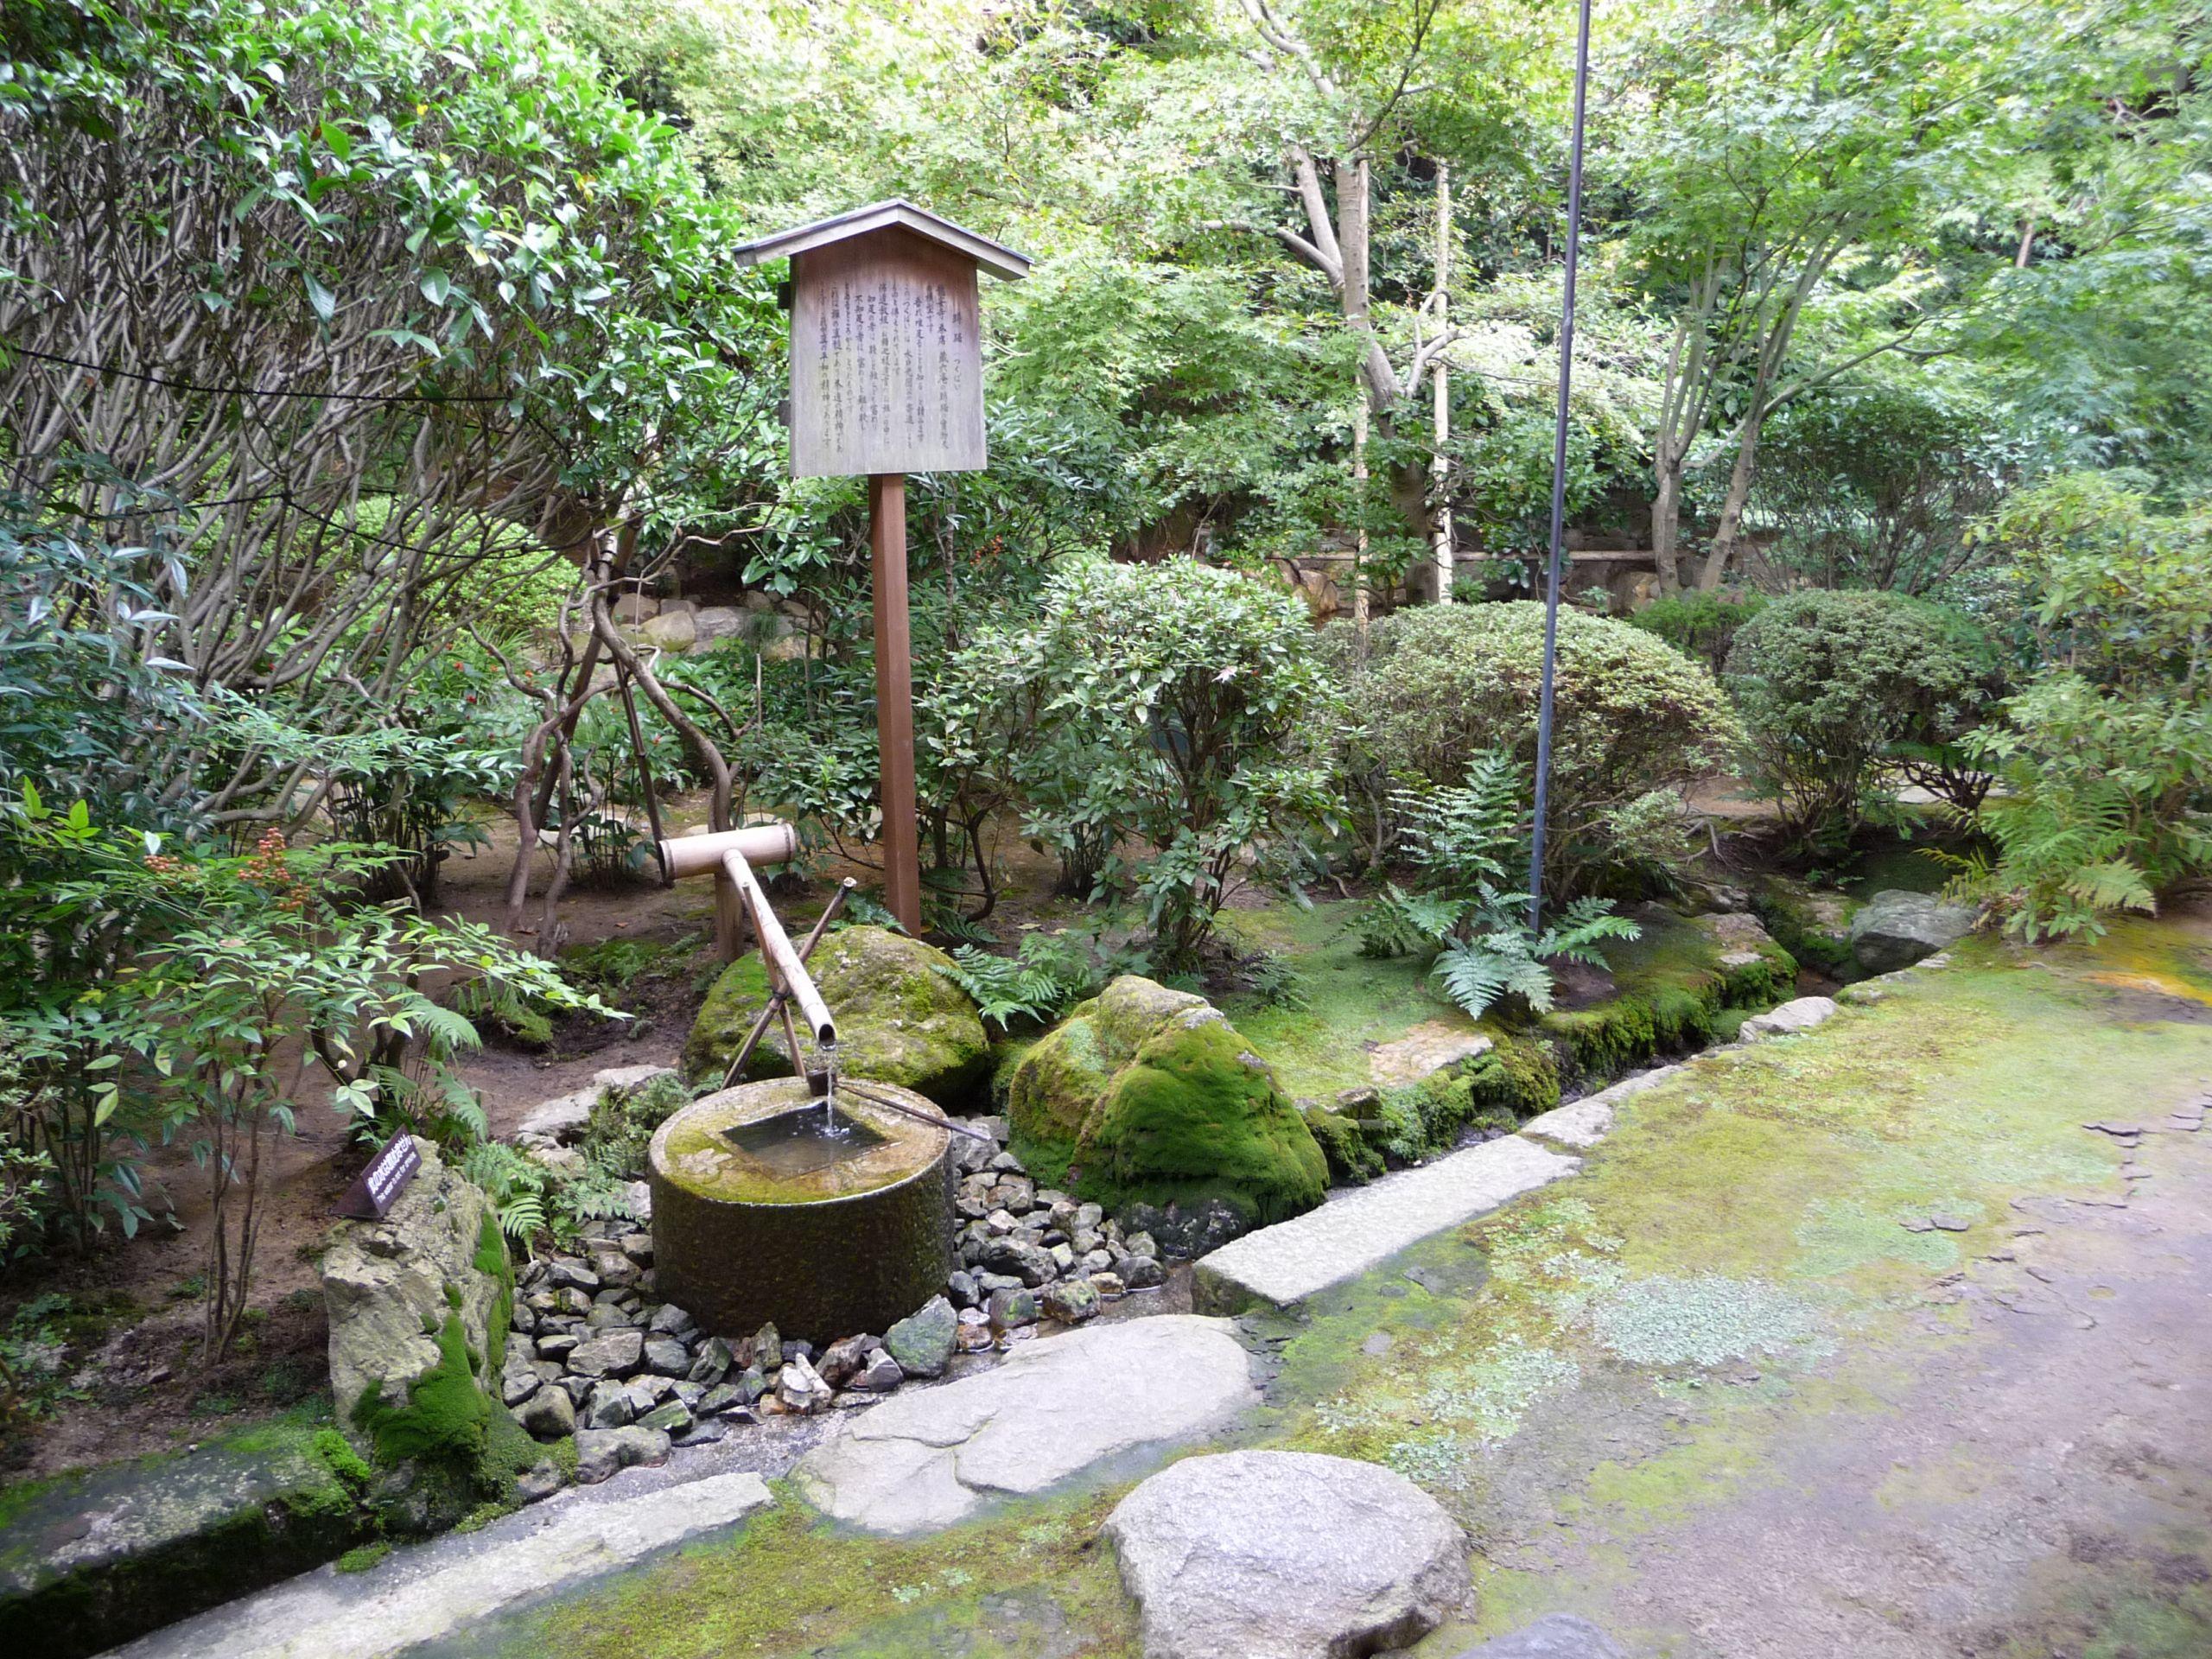 Fontaine Jardin Japonais Kyoto Jour 2 Kinkaku Ji Ryōan Ji Et Ginkakuji